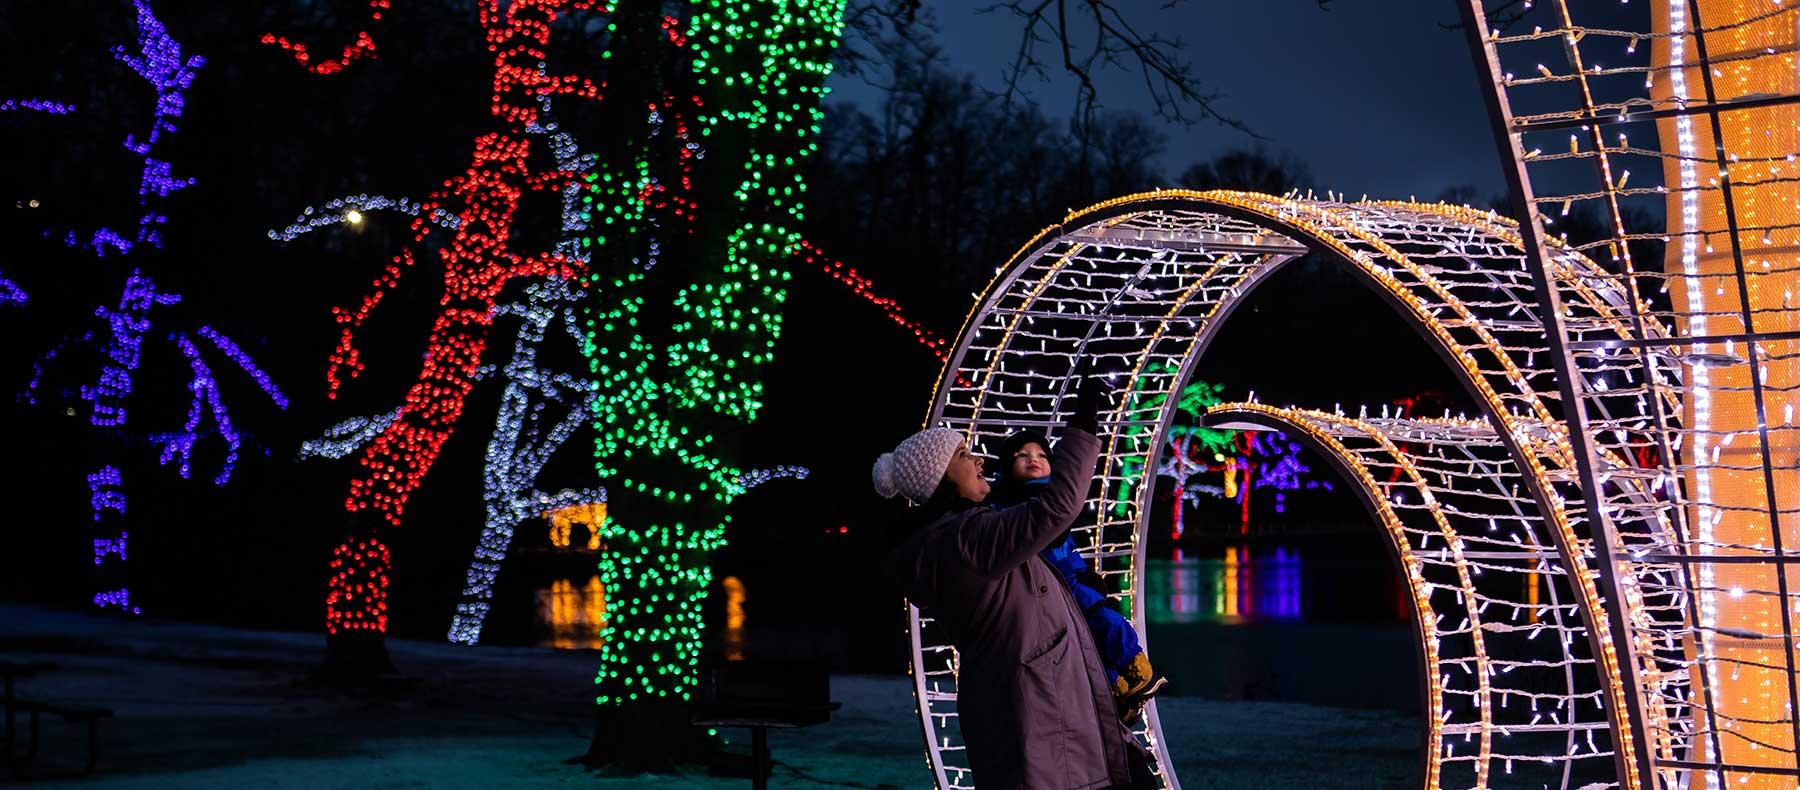 Niagara Falls Christmas Lights 2020 A Guide to the 2020 Niagara Falls Winter Festival of Lights